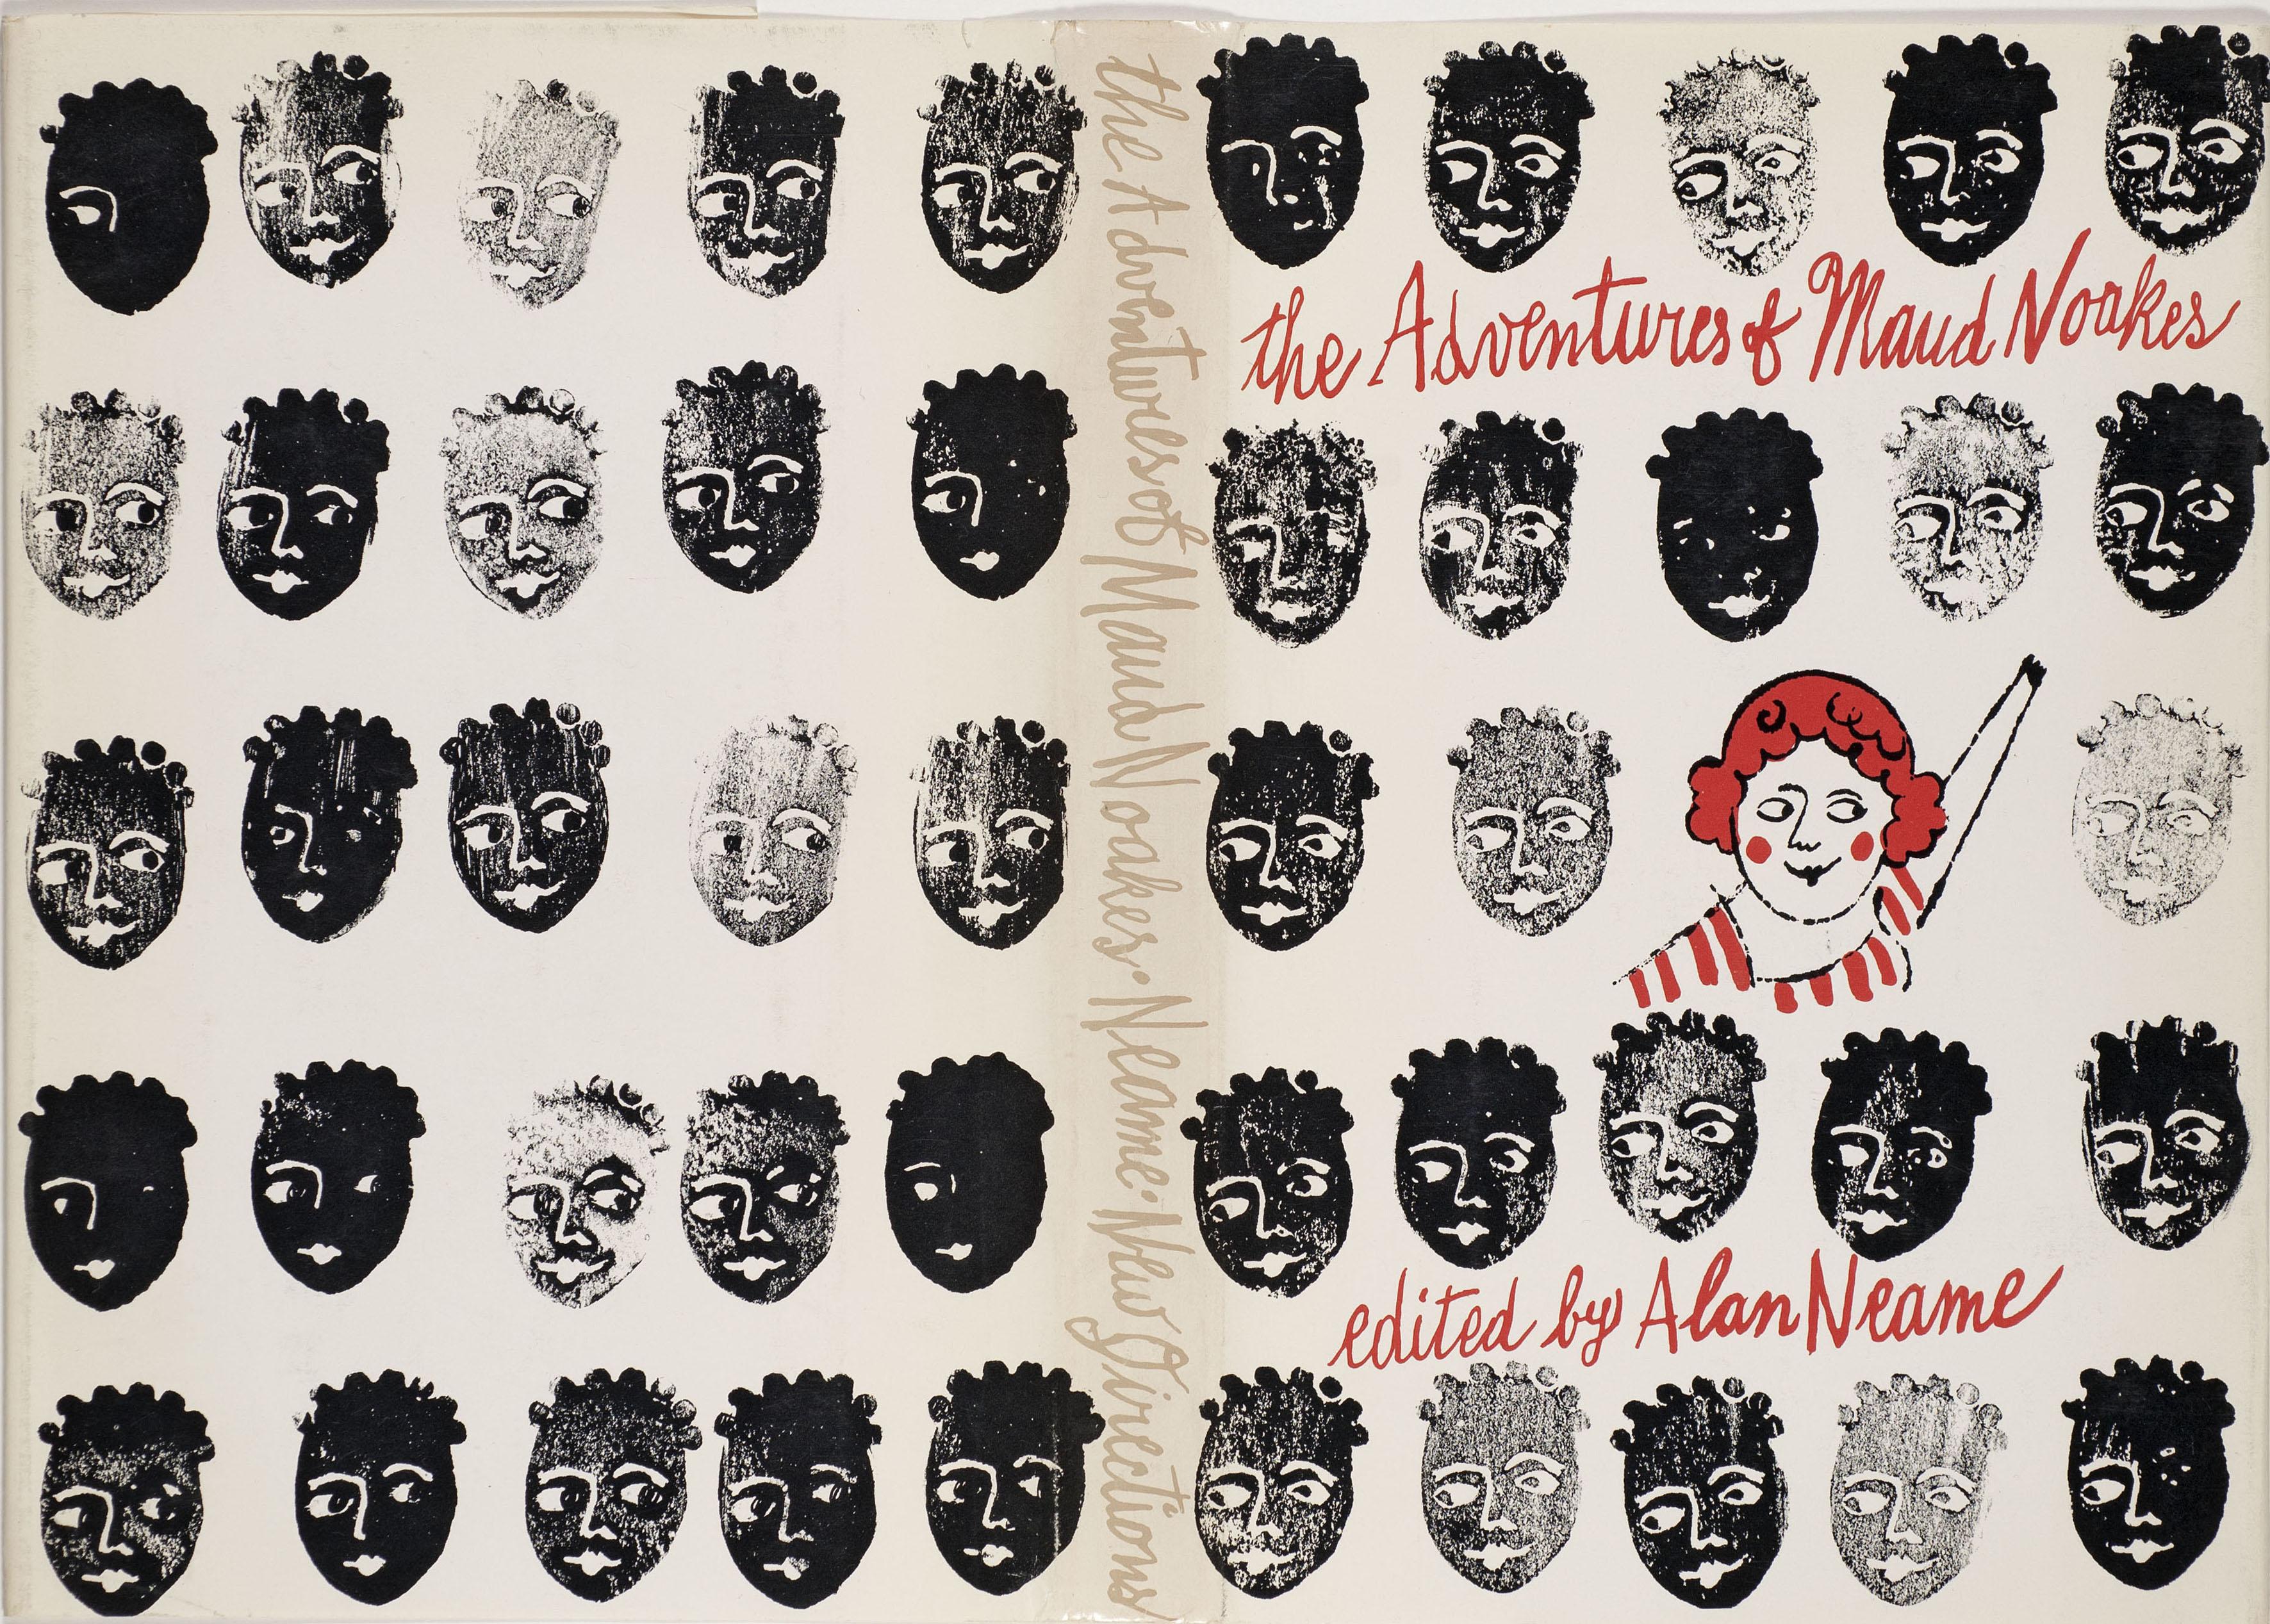 2013-09-24-Warhol_TheAdventures.jpg